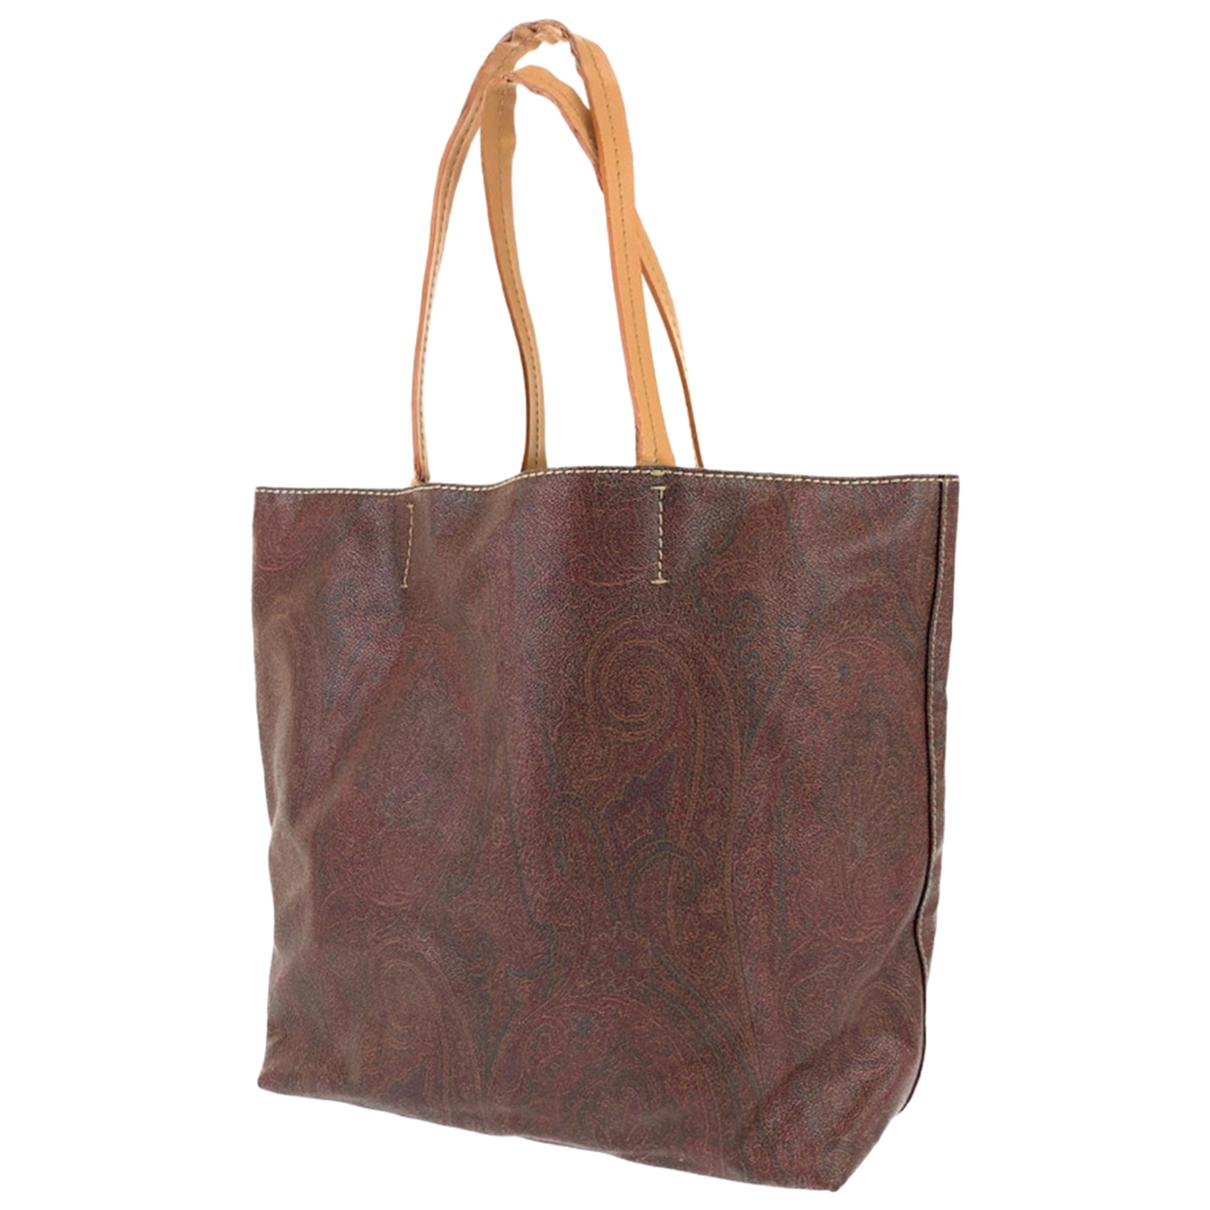 Etro N Leather handbag for Women N